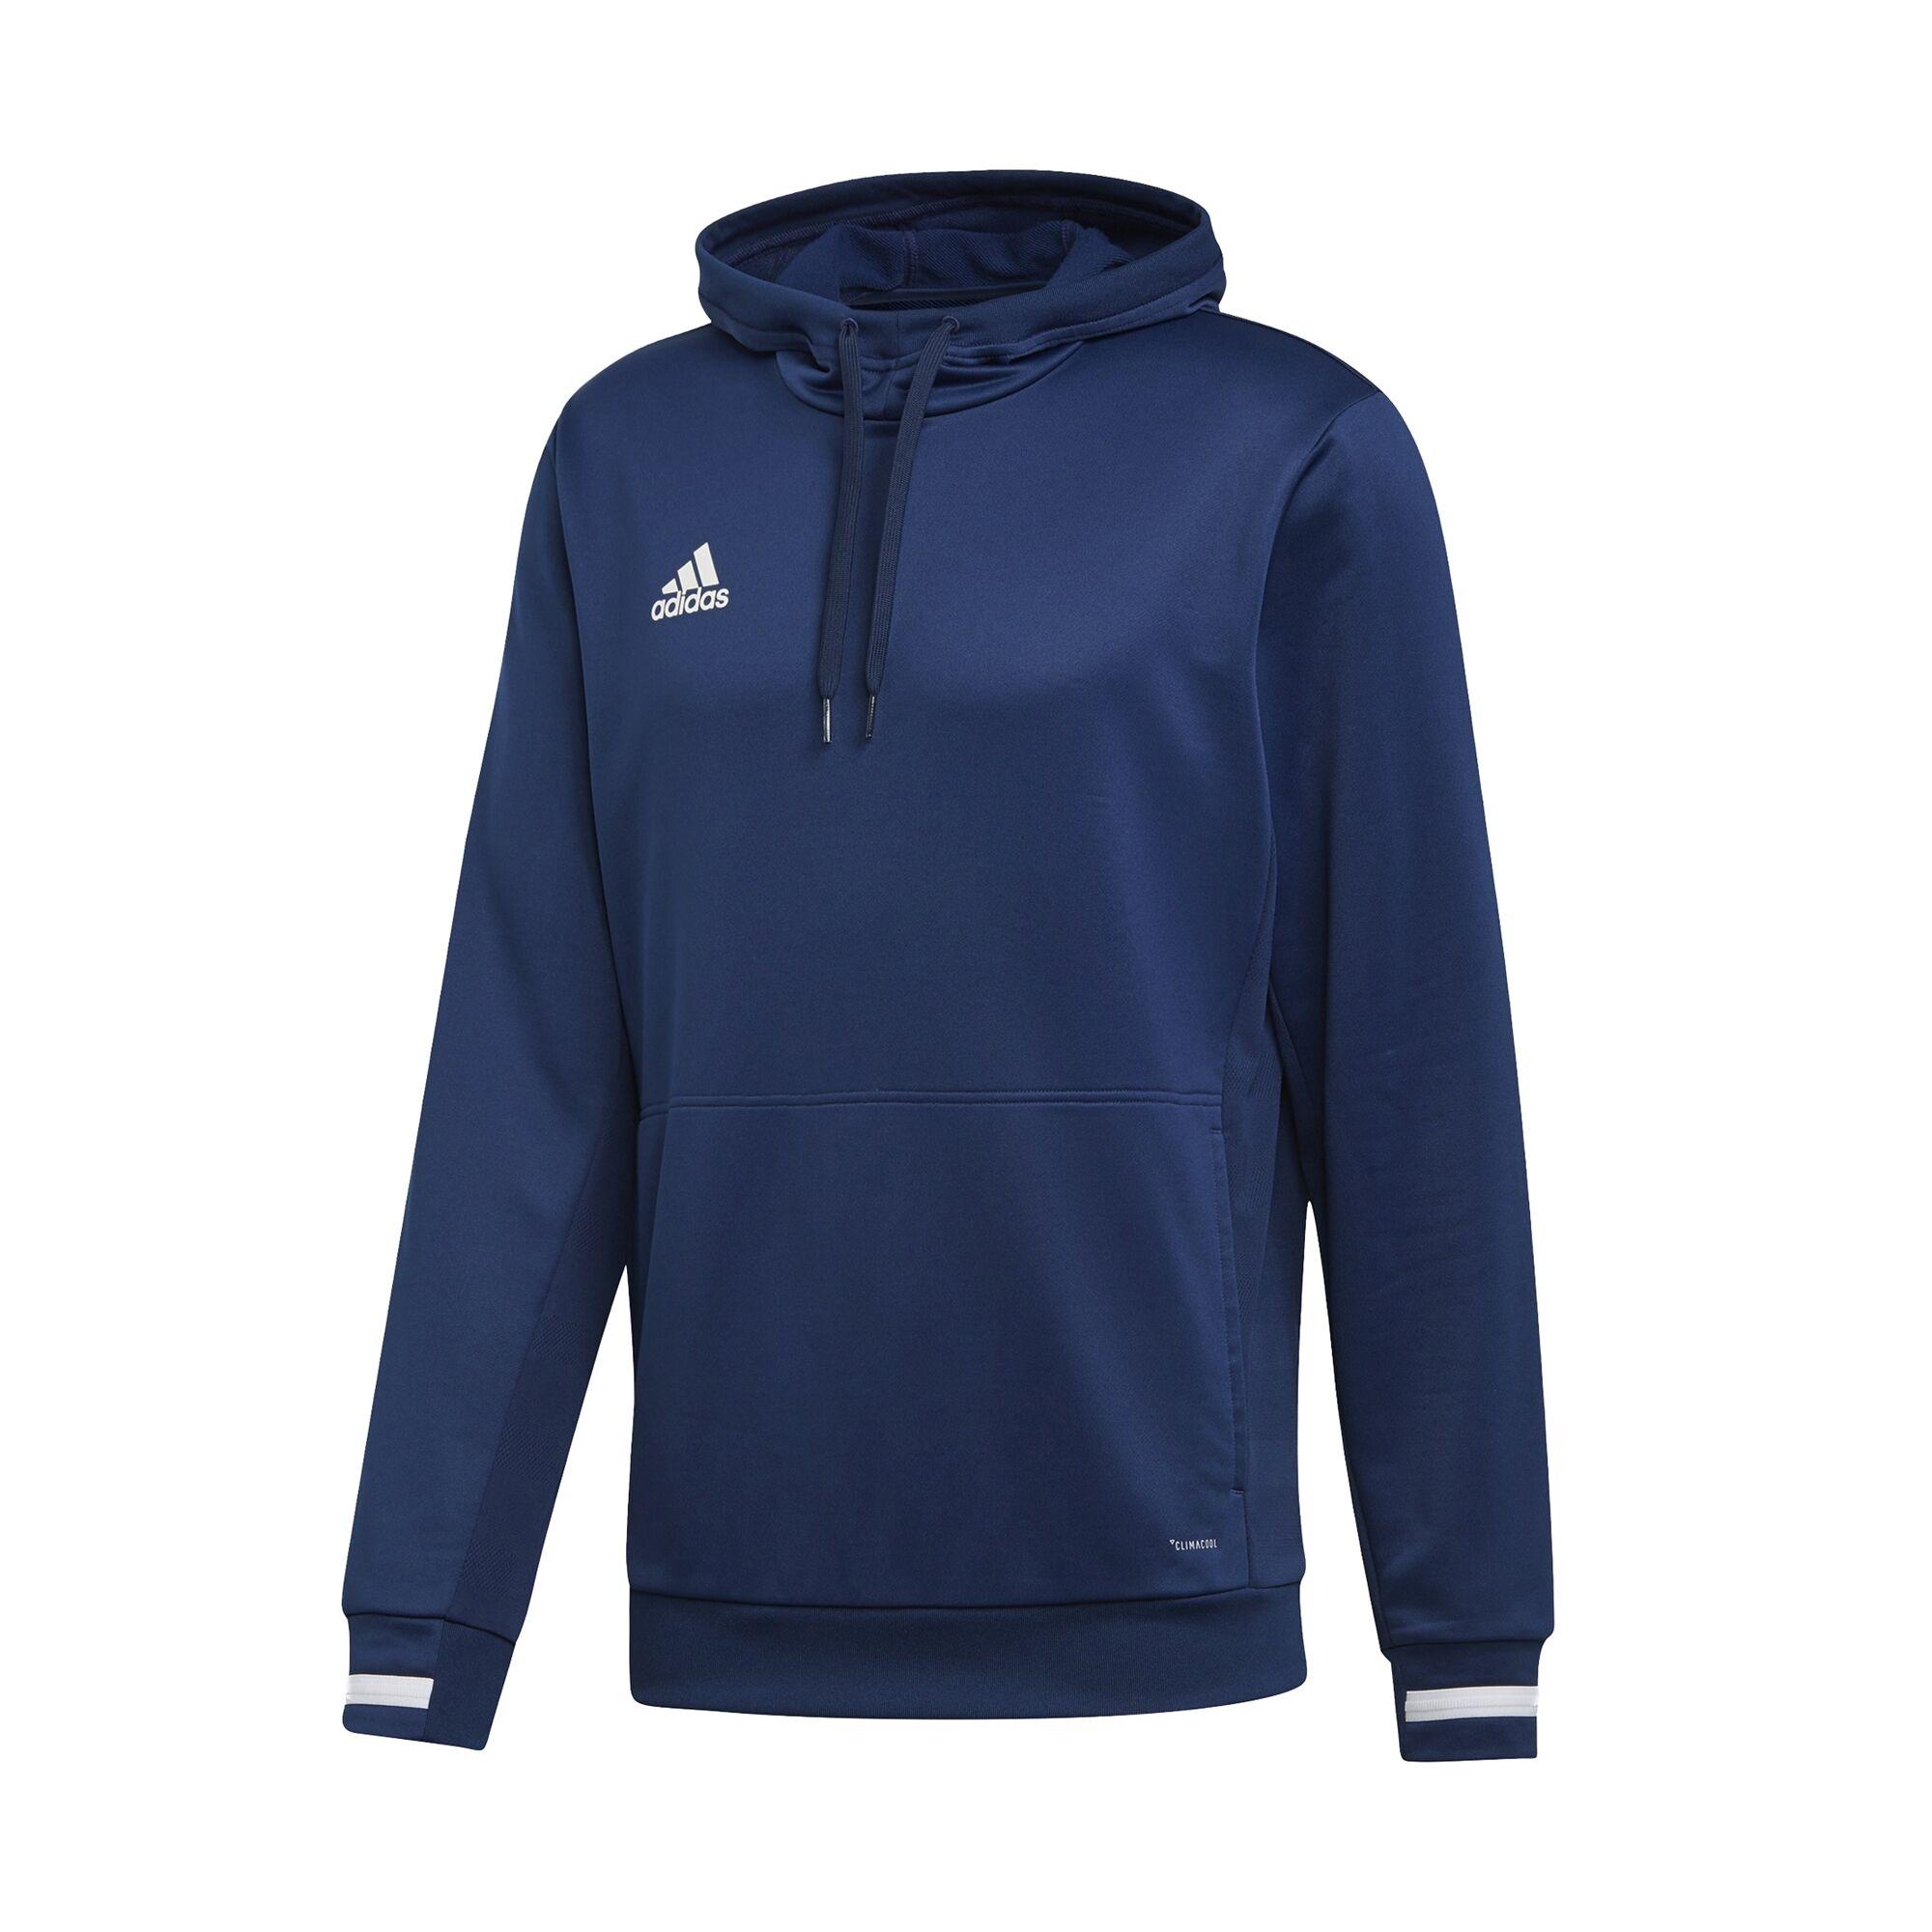 Image of Adidas T19 Hoody Men Navy M